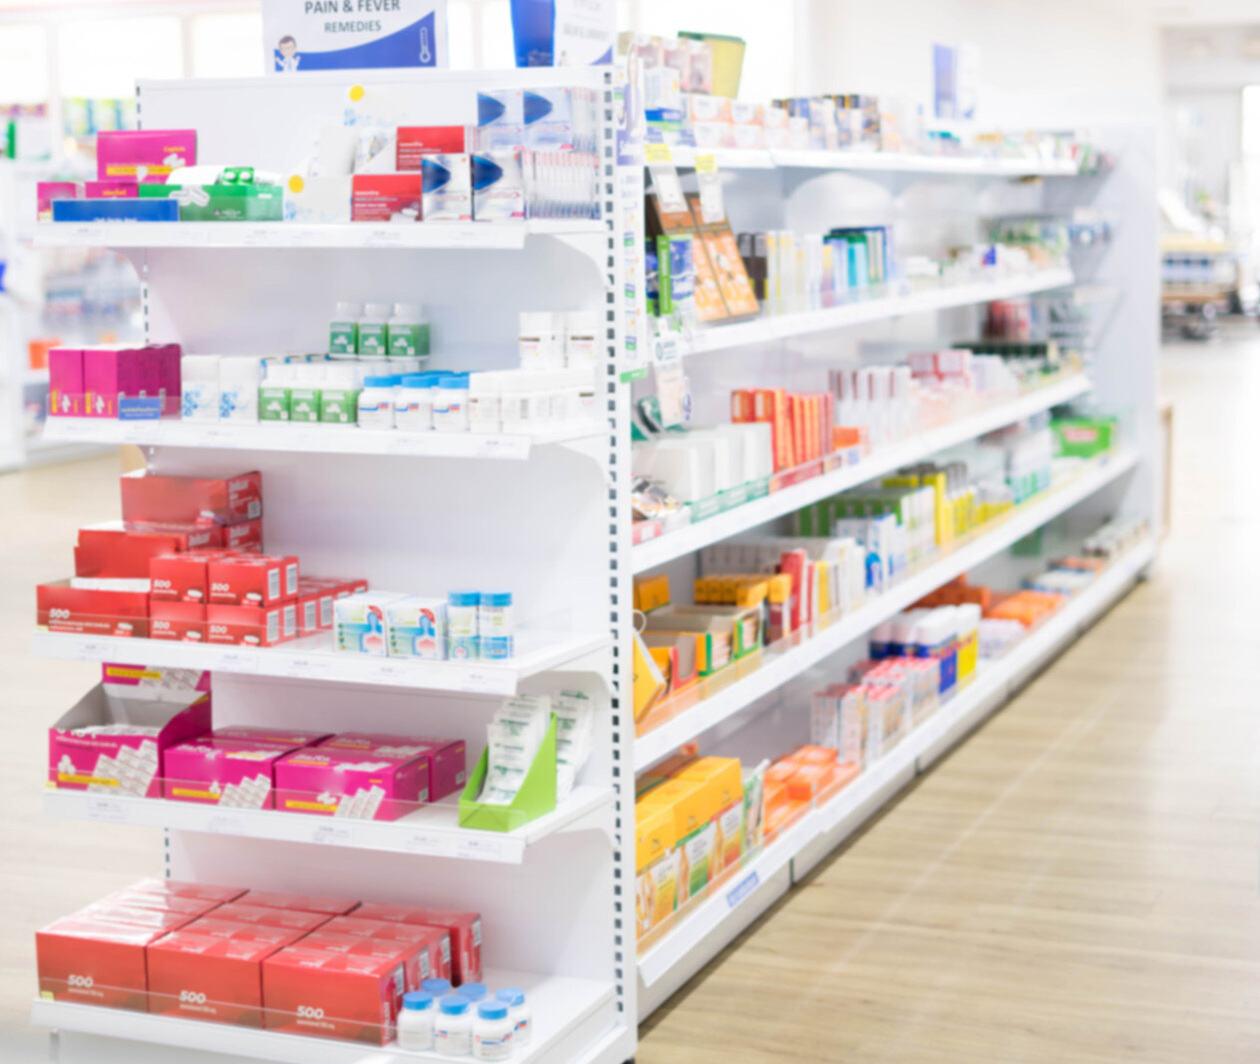 Good Pharmacy Practice: Medication Management